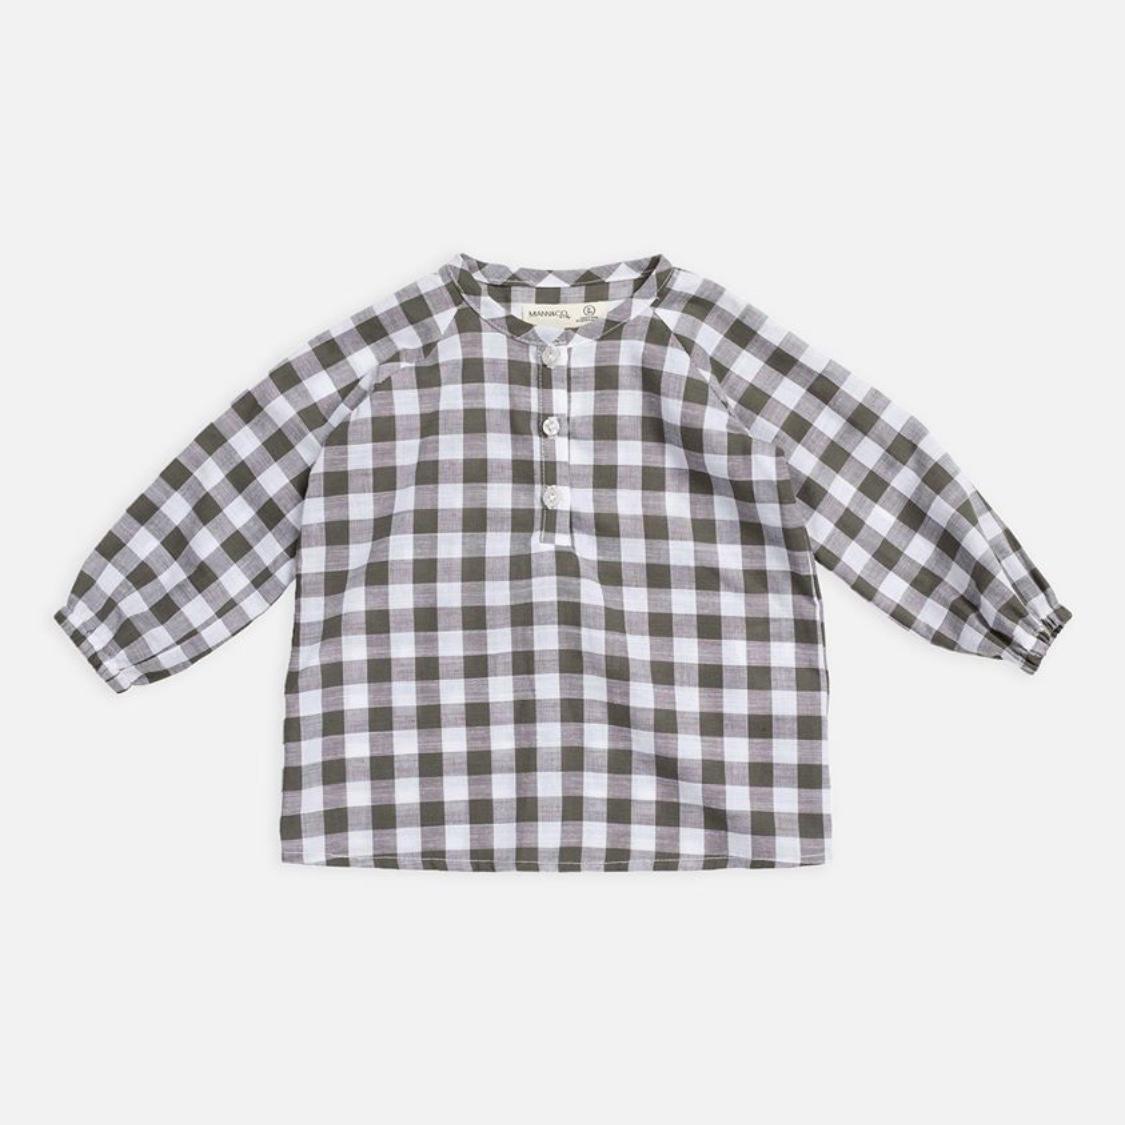 Miann & Co Baby Raglan Long Sleeve Flowy Shirt $40